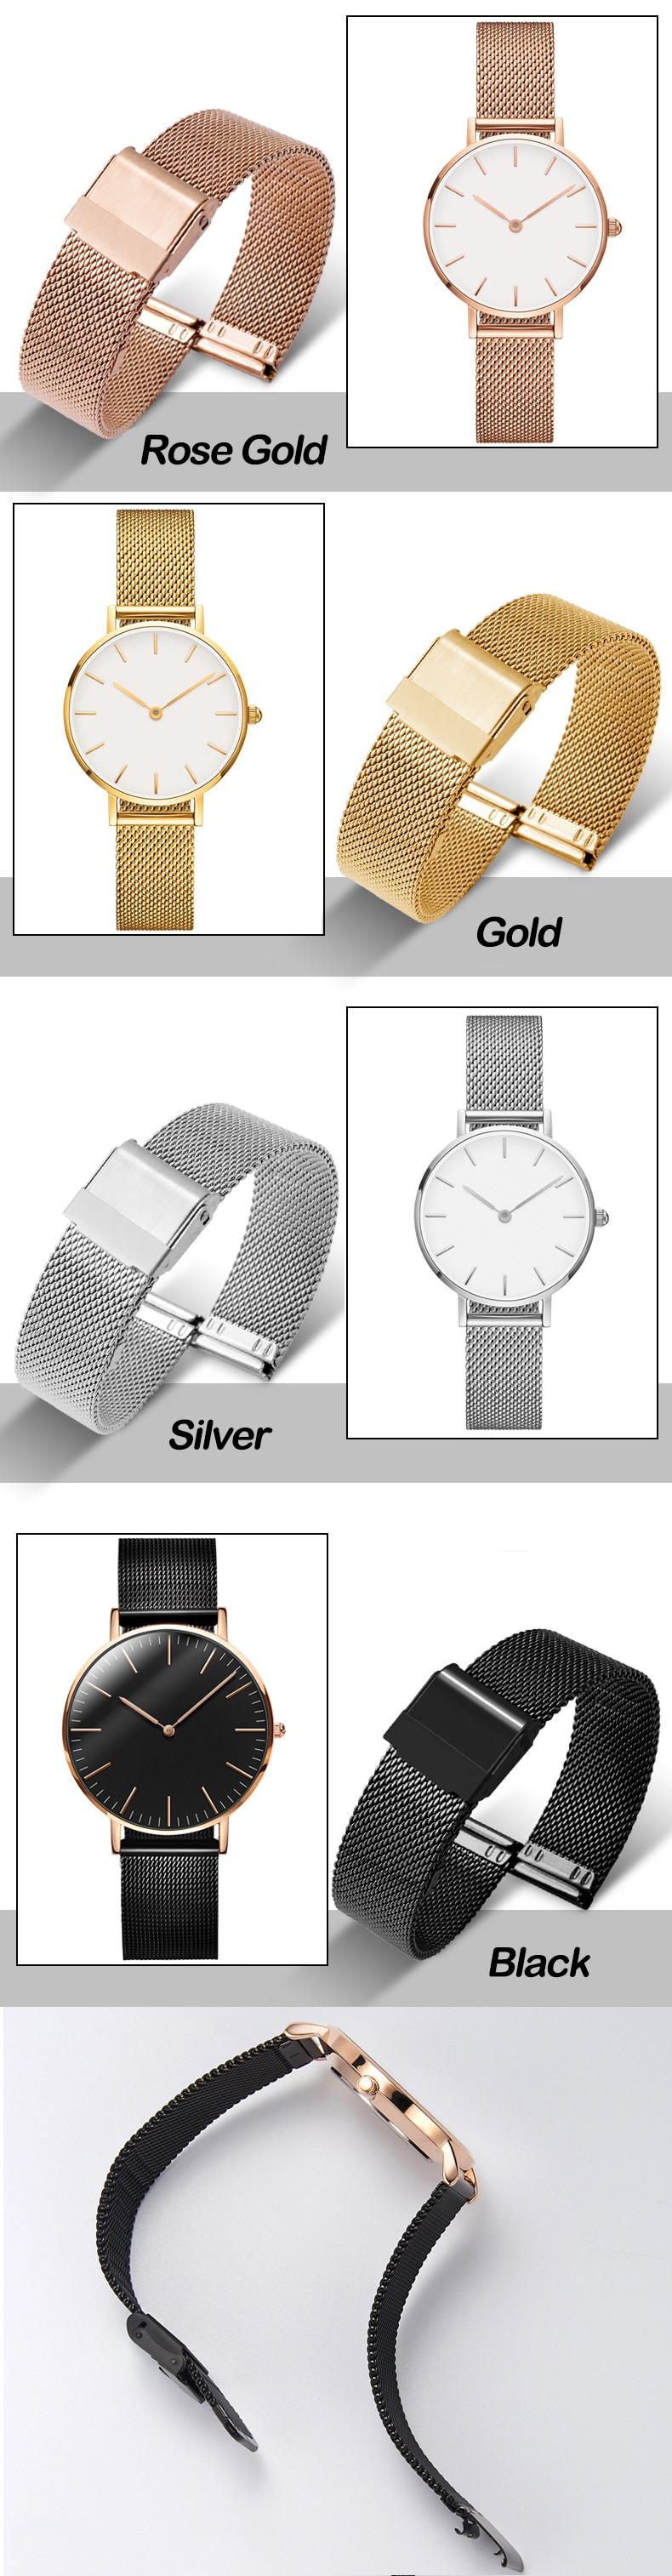 Steel mesh watch band (10-22 mm)